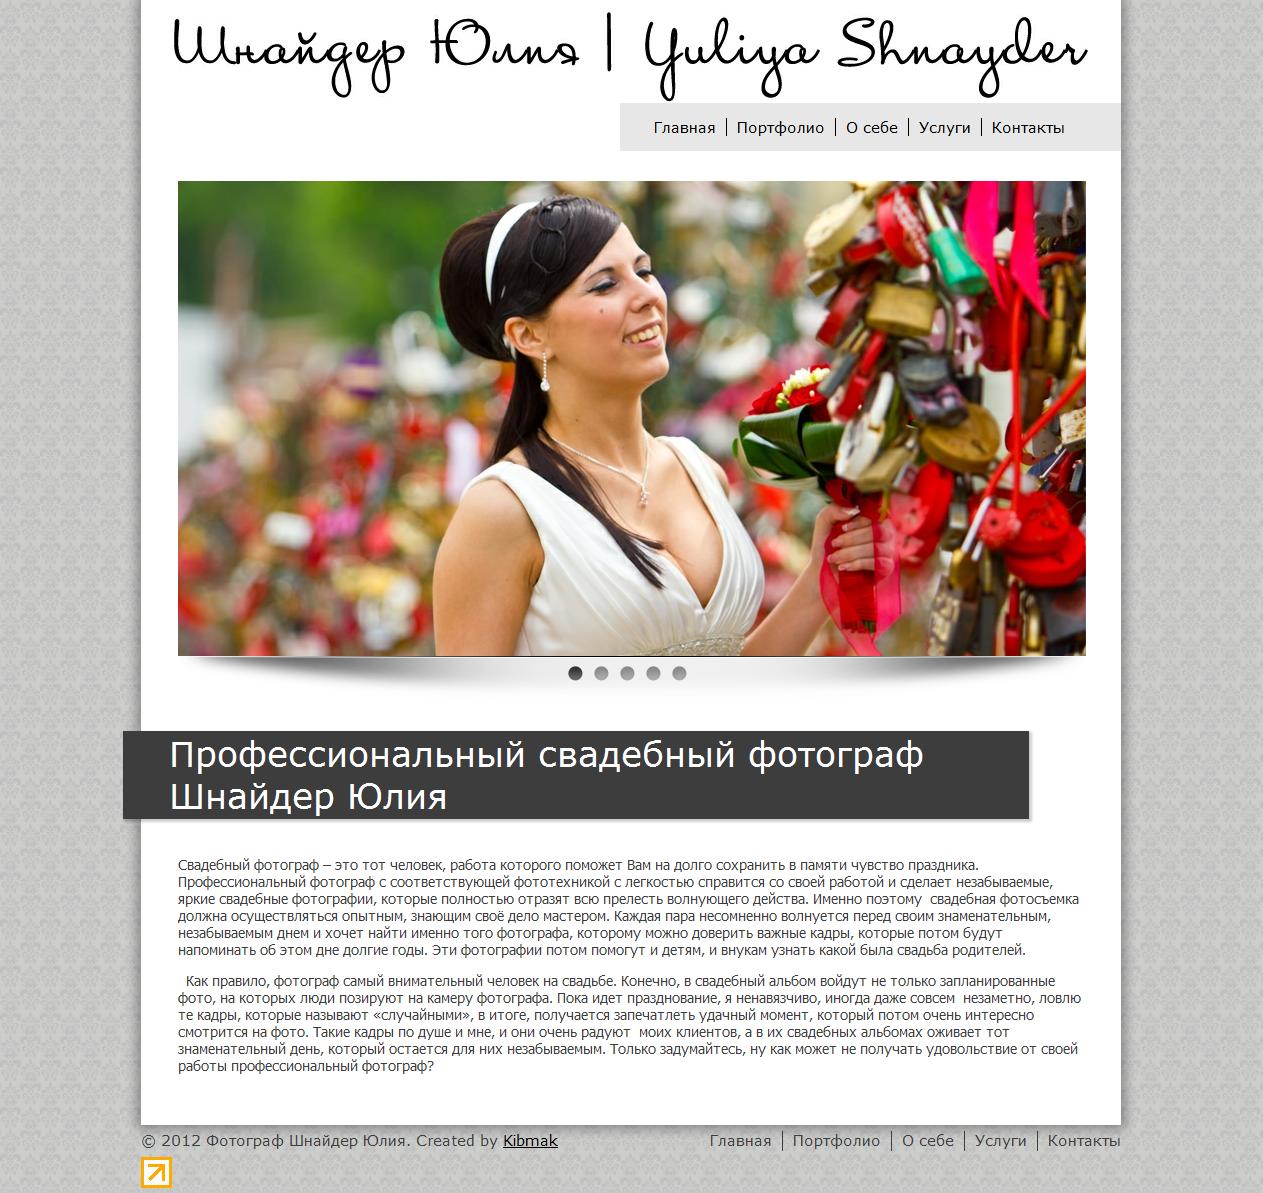 Сайт для фотографа Шнайдер Юлии